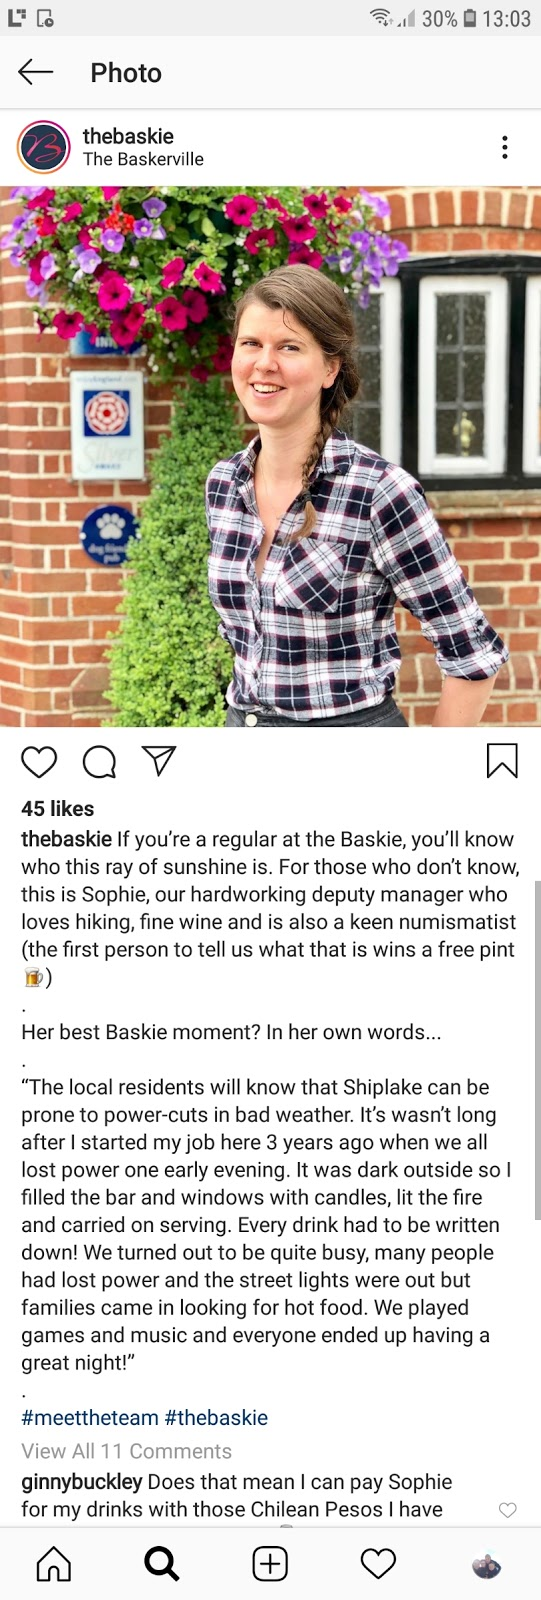 thebaskie using instagram for pub marketing.jpg